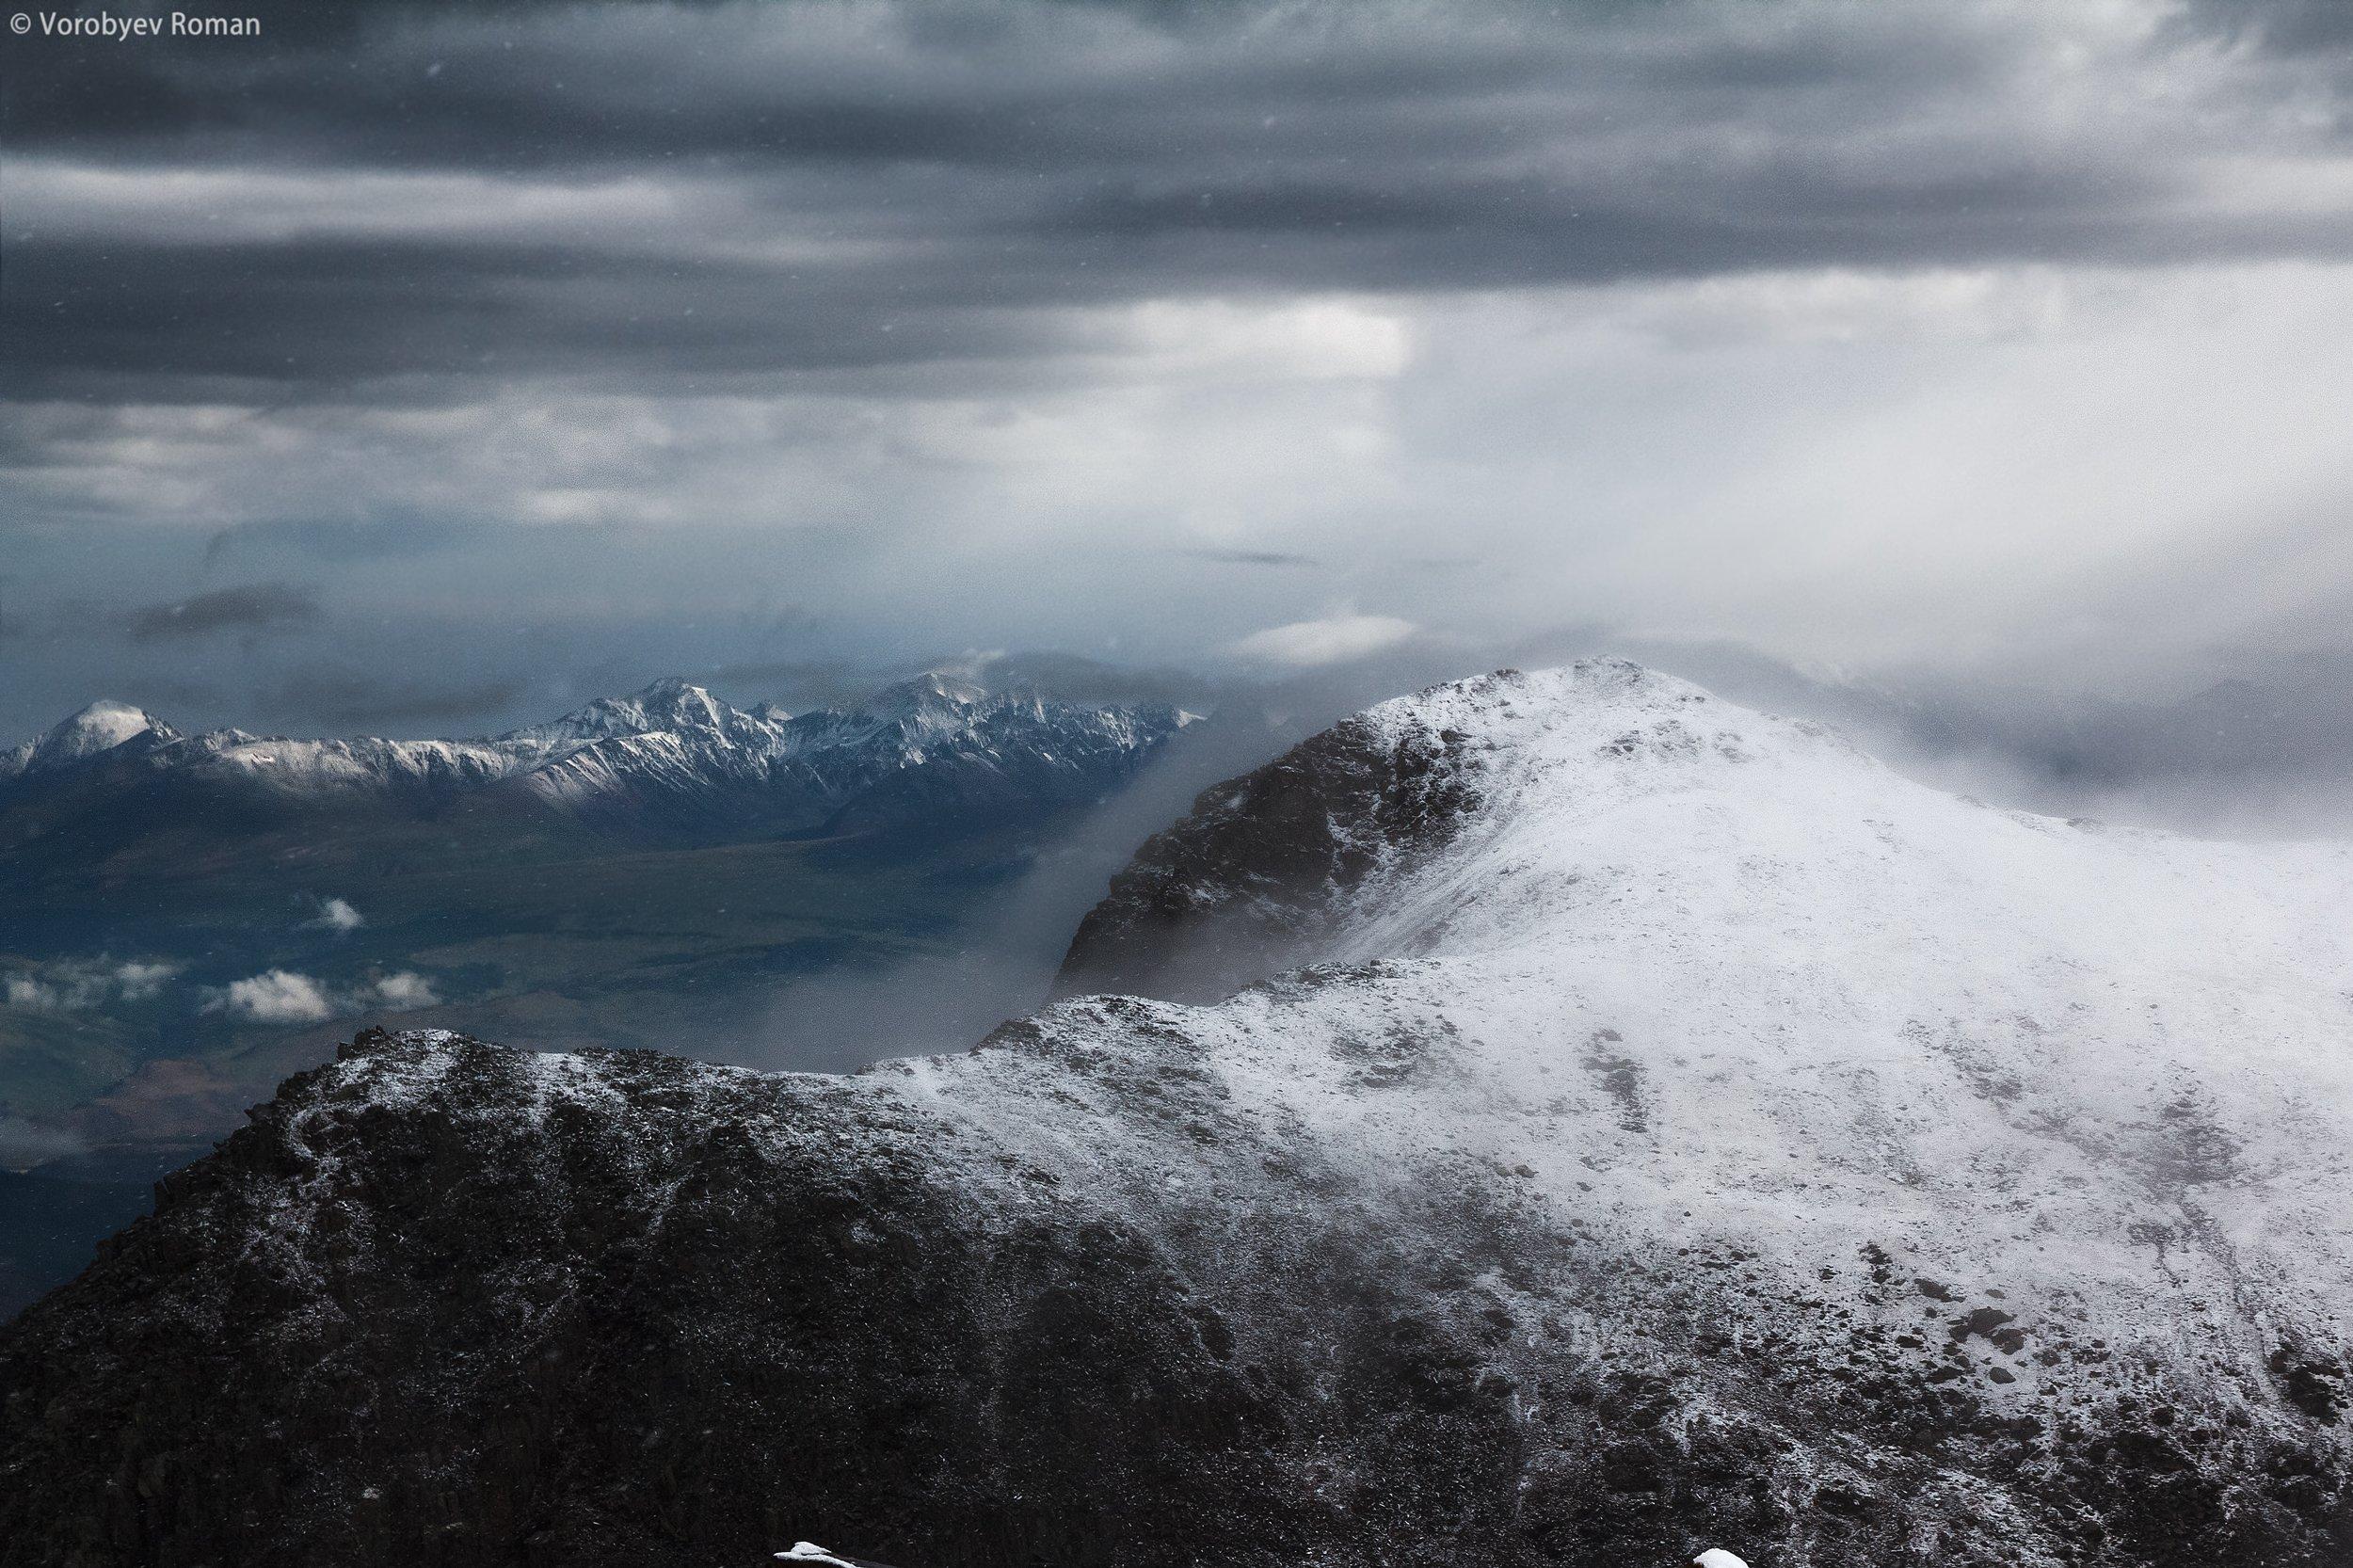 актру, алтай, горный алтай, горы, свет, снег, Roman Vorobyev